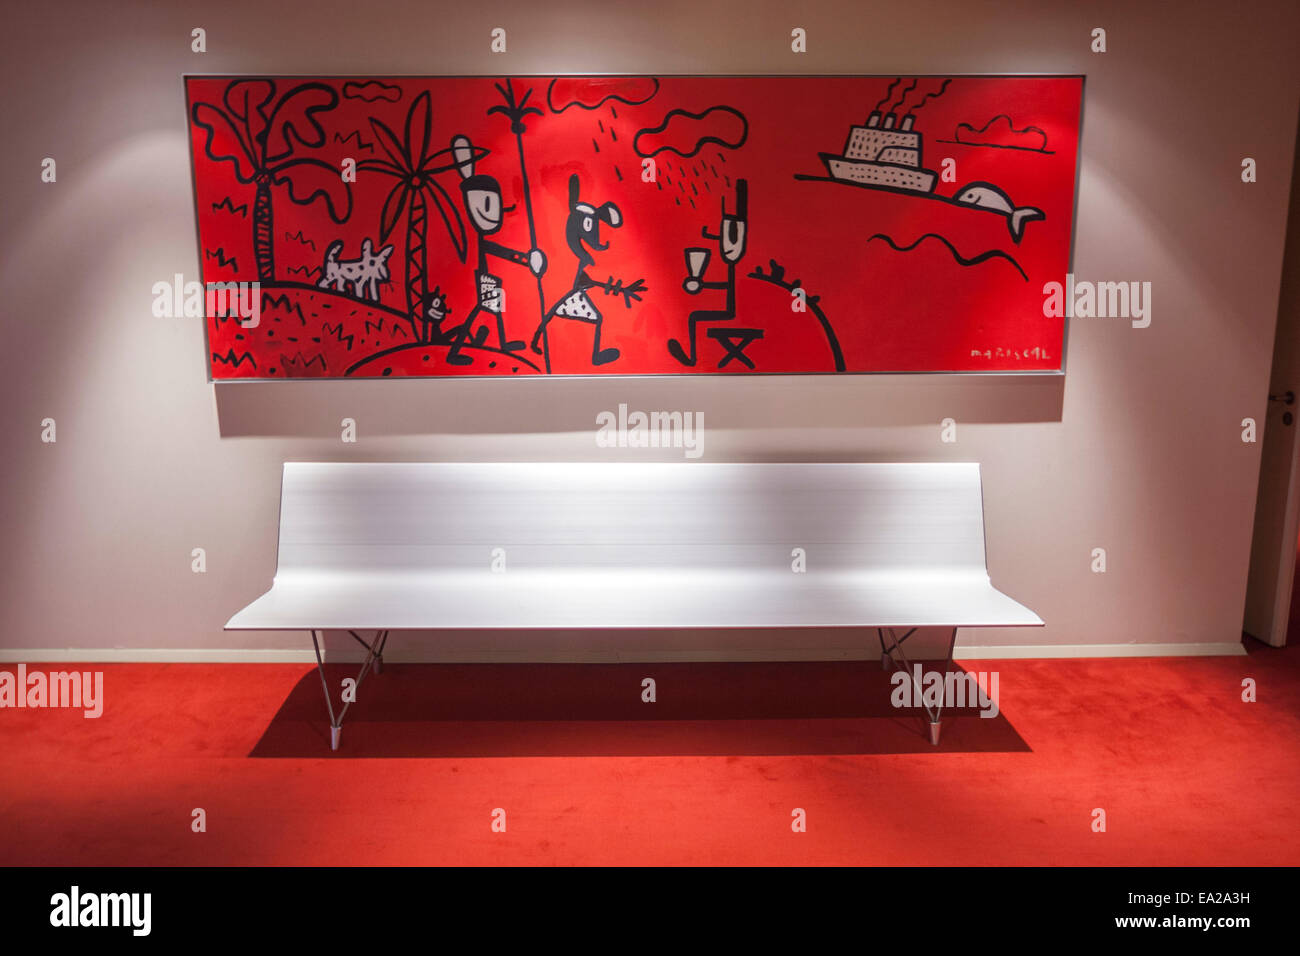 https://c8.alamy.com/comp/EA2A3H/silken-gran-hotel-domine-bilbao-interior-designed-by-studio-mariscal-EA2A3H.jpg